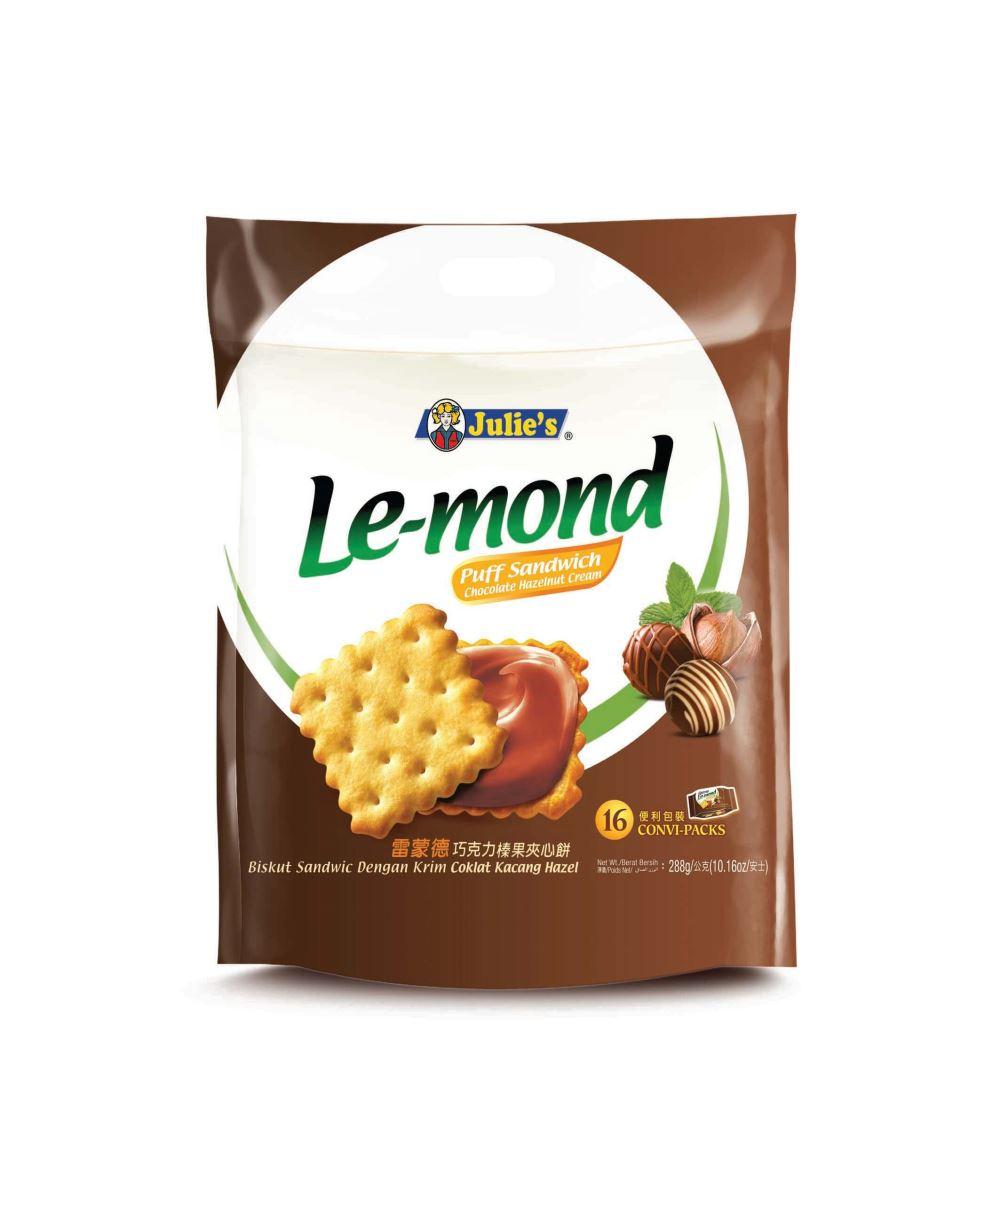 Le-Mond Puff Sandwich Chocolate Hazelnut Cream 288g